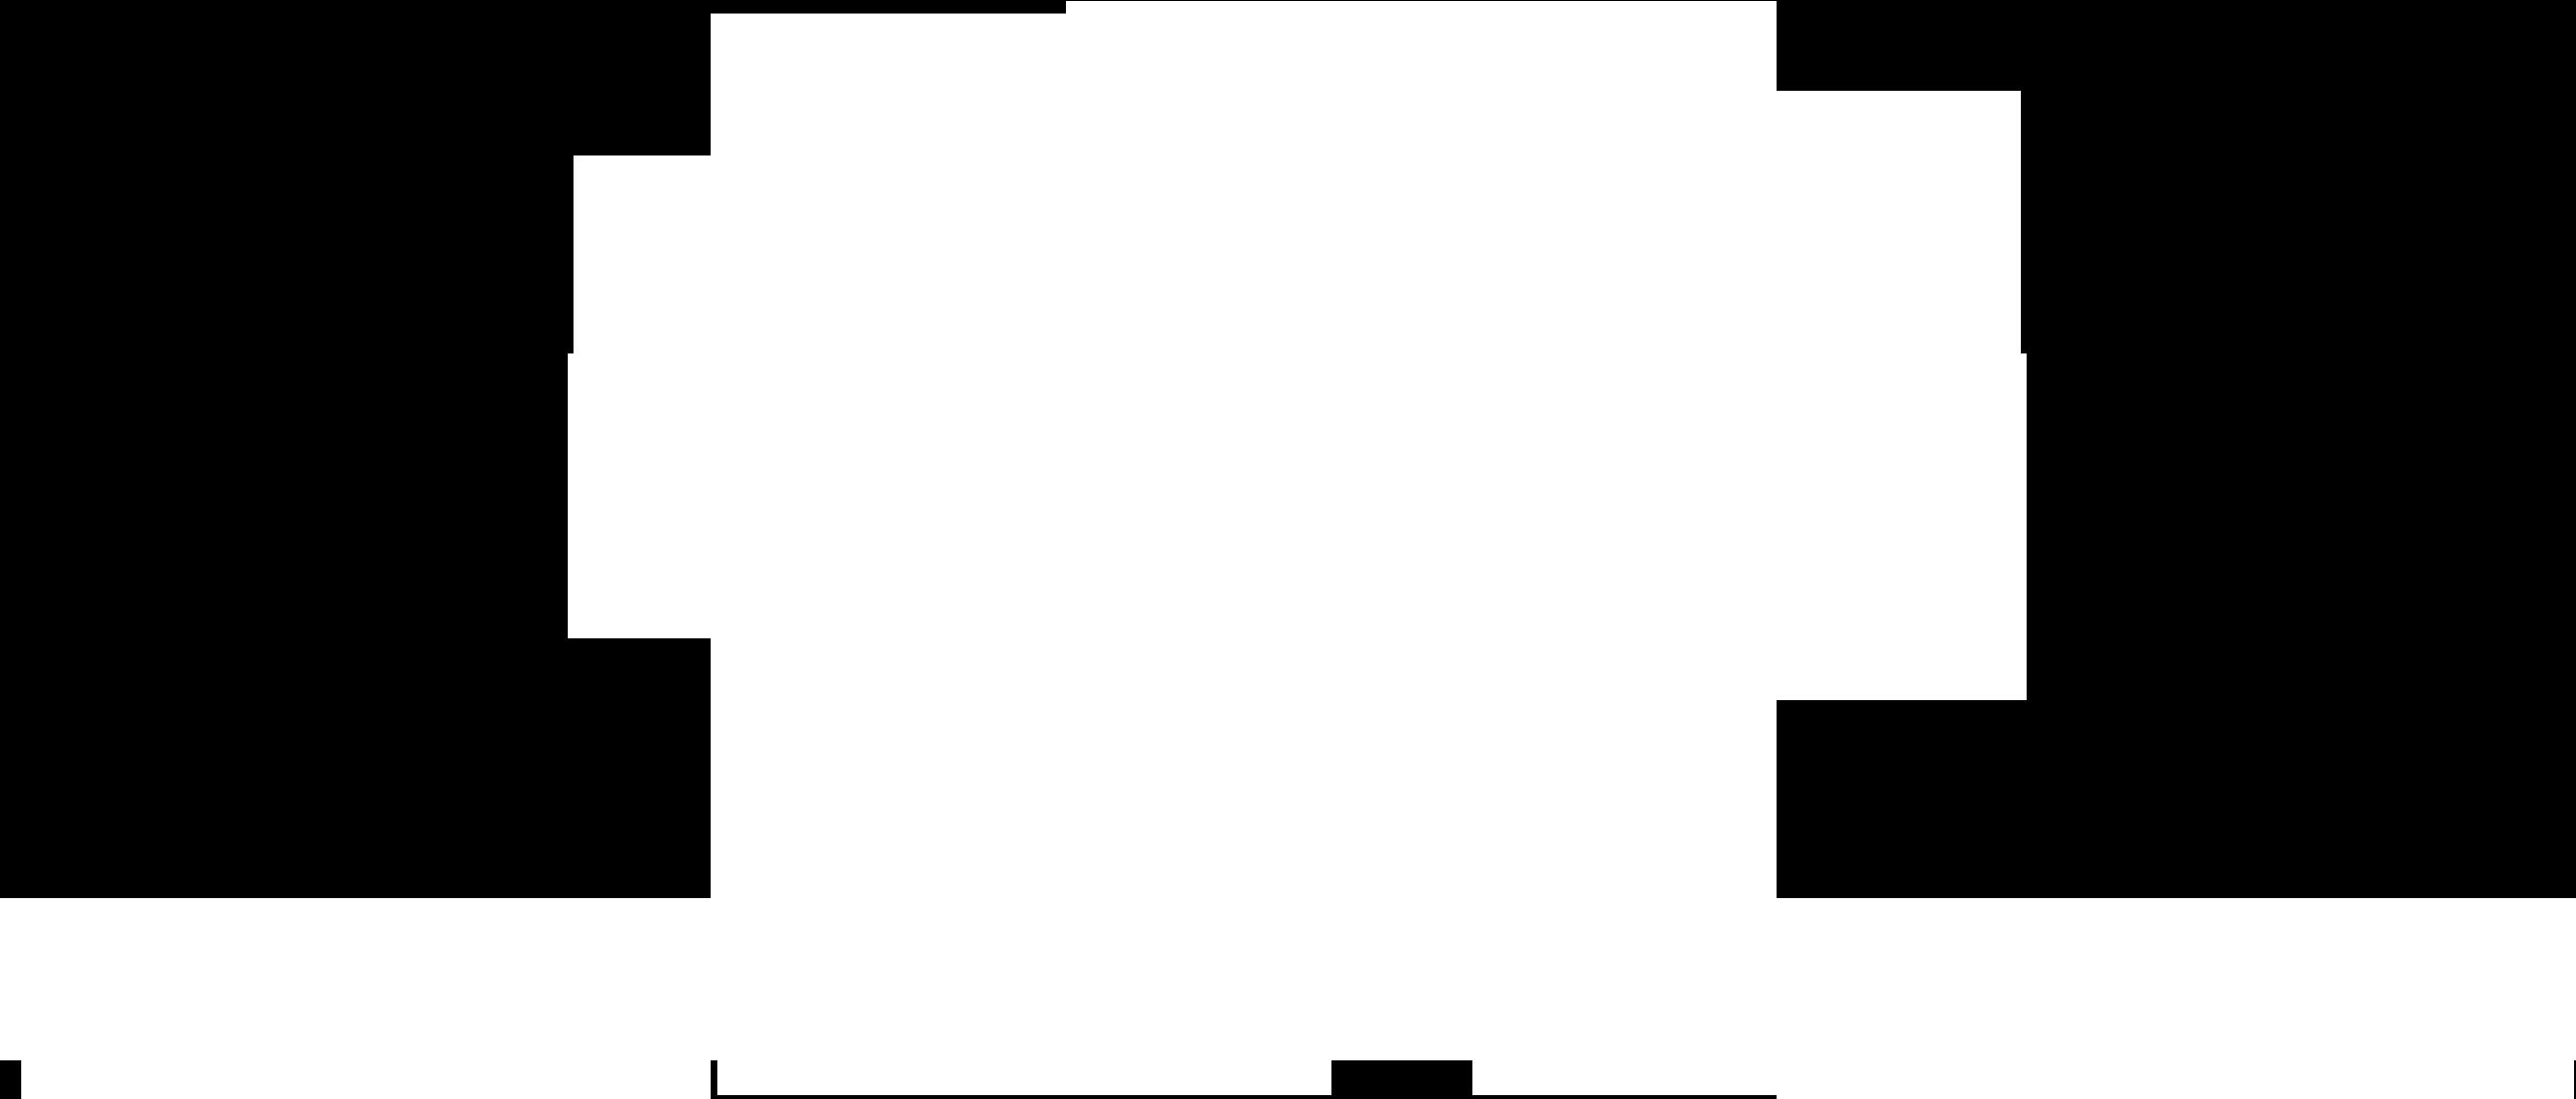 https://suncountrymarinegroup.com/wp-content/uploads/2021/05/cobalt-boats-logo-t-w.png